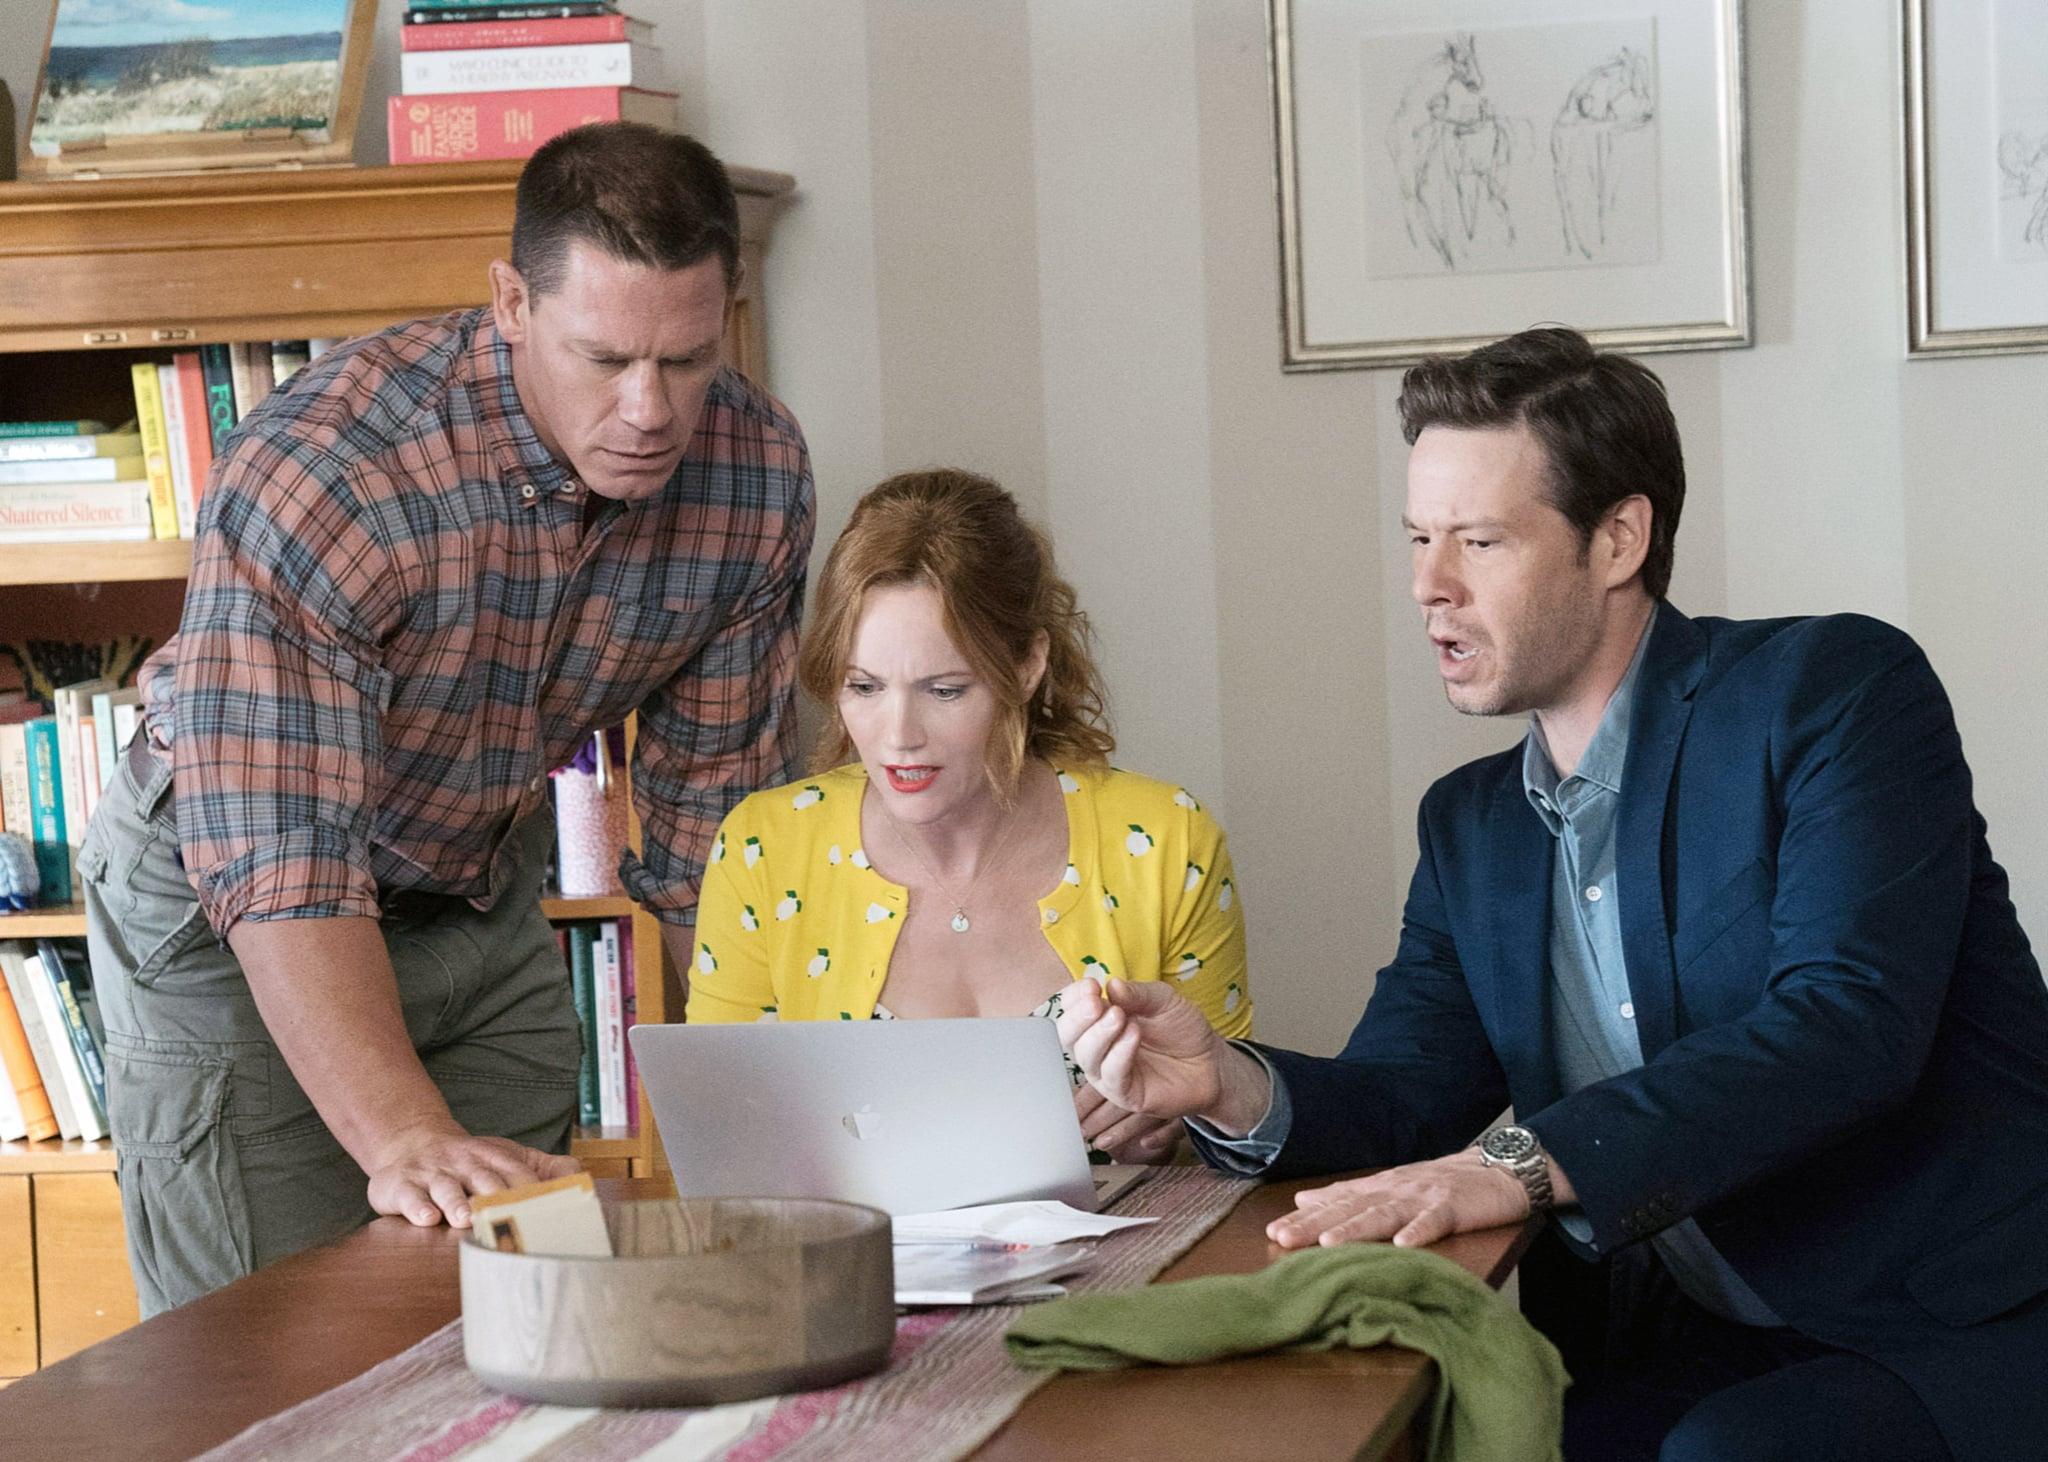 BLOCKERS, from left: John Cena, Leslie Mann, Ike Barinholtz, 2018. ph: Quantrell D. Colbert / Universal Pictures /Courtesy Everett Collection